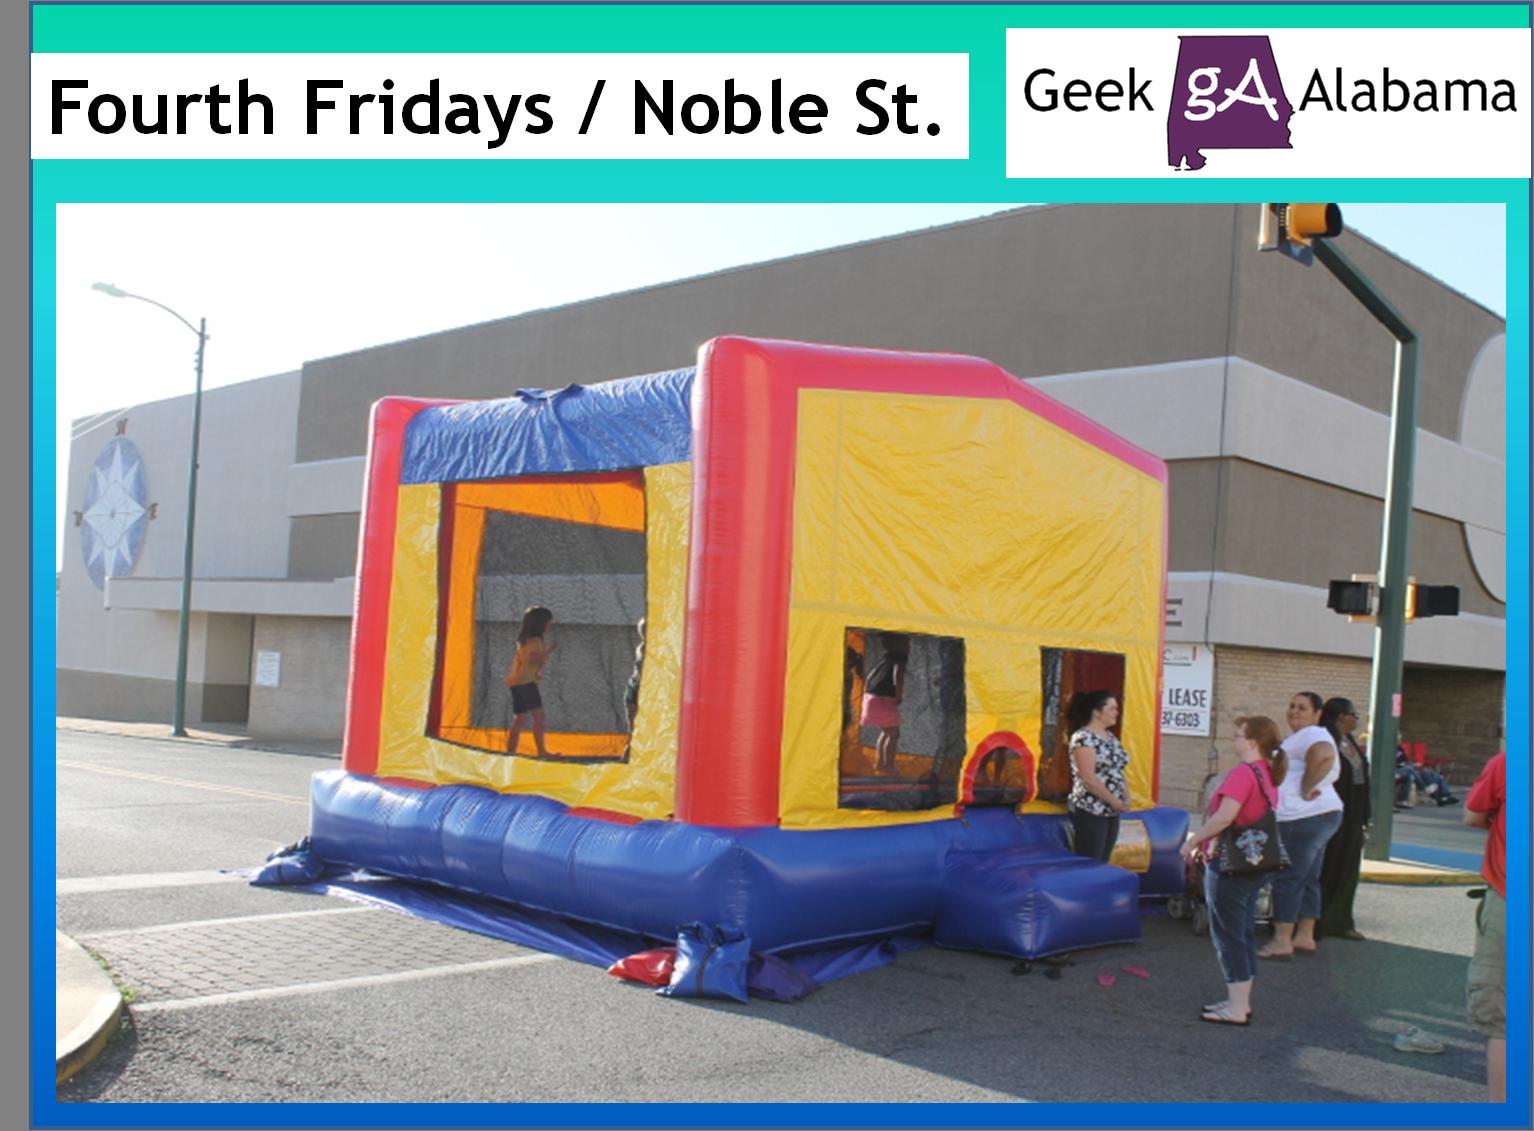 Fourth Fridays On Noble Street April 2014 Geek Alabama